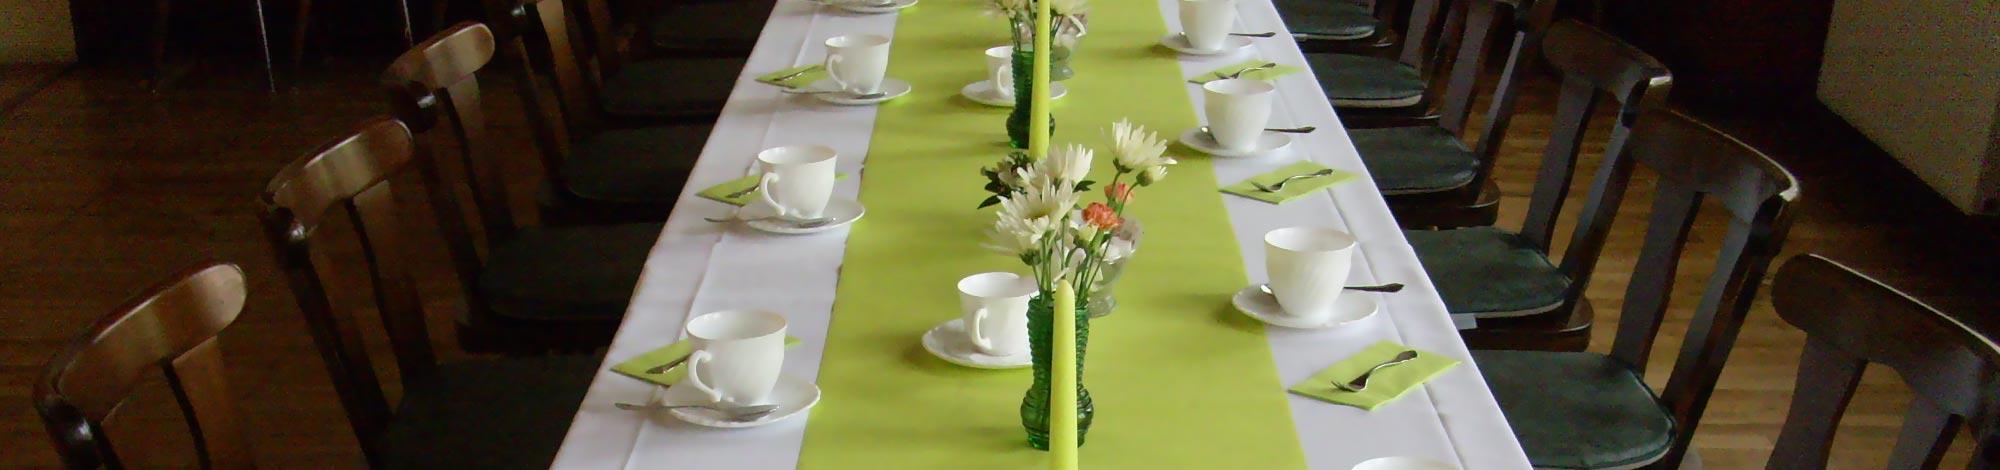 Gedeckte tafel in der Gaststätte Ratskeller in Kemberg